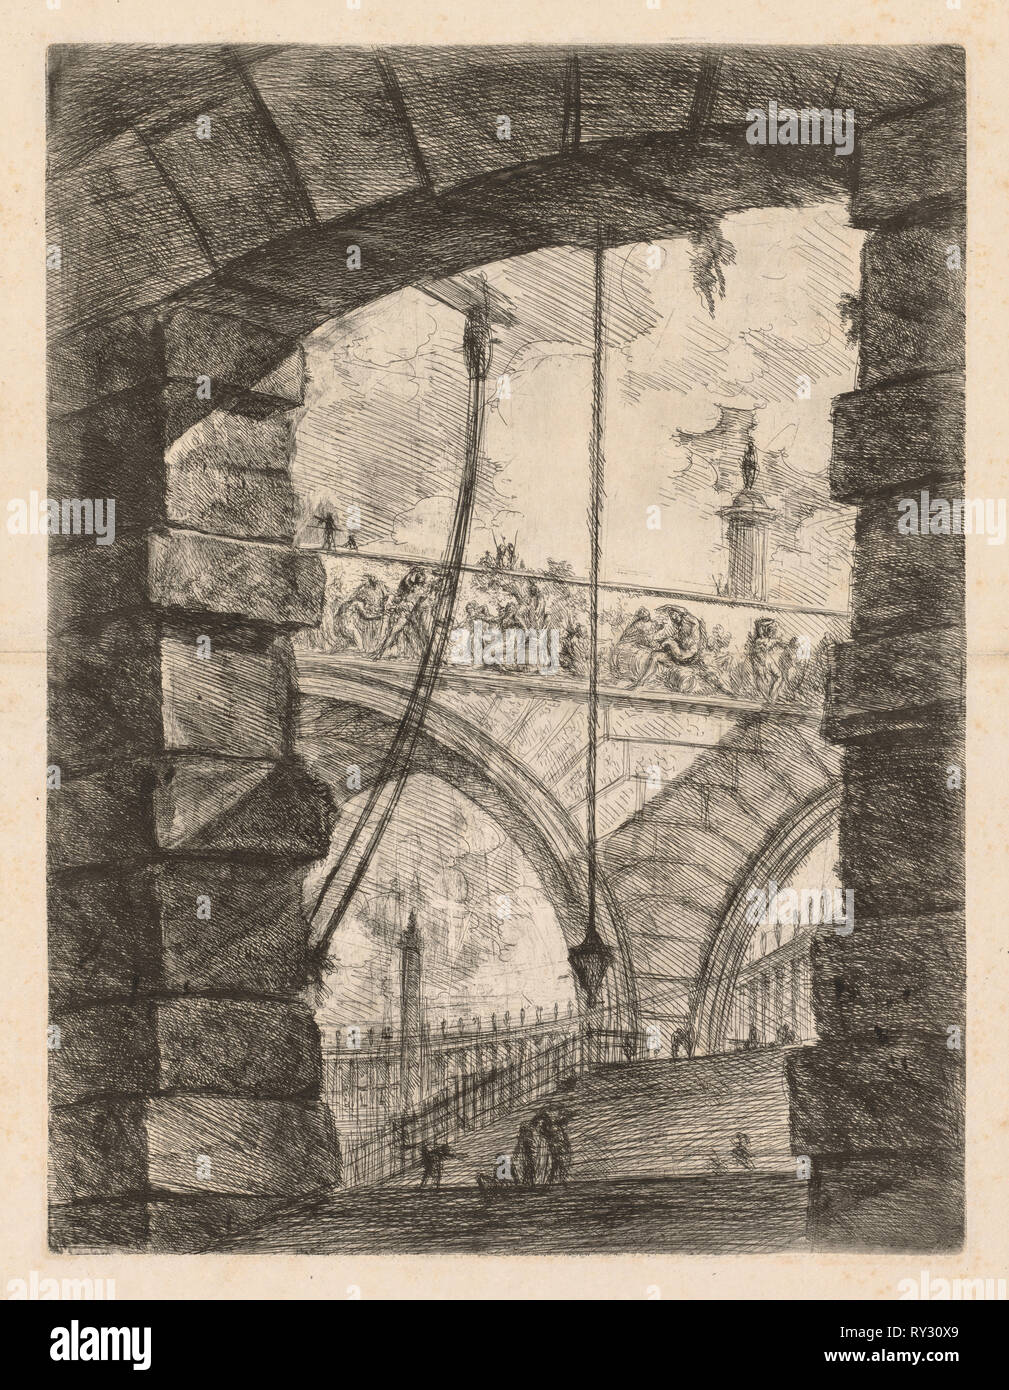 The Prisons:  A Lofty Arch with a Frieze, 1745-1750. Giovanni Battista Piranesi (Italian, 1720-1778). Etching - Stock Image